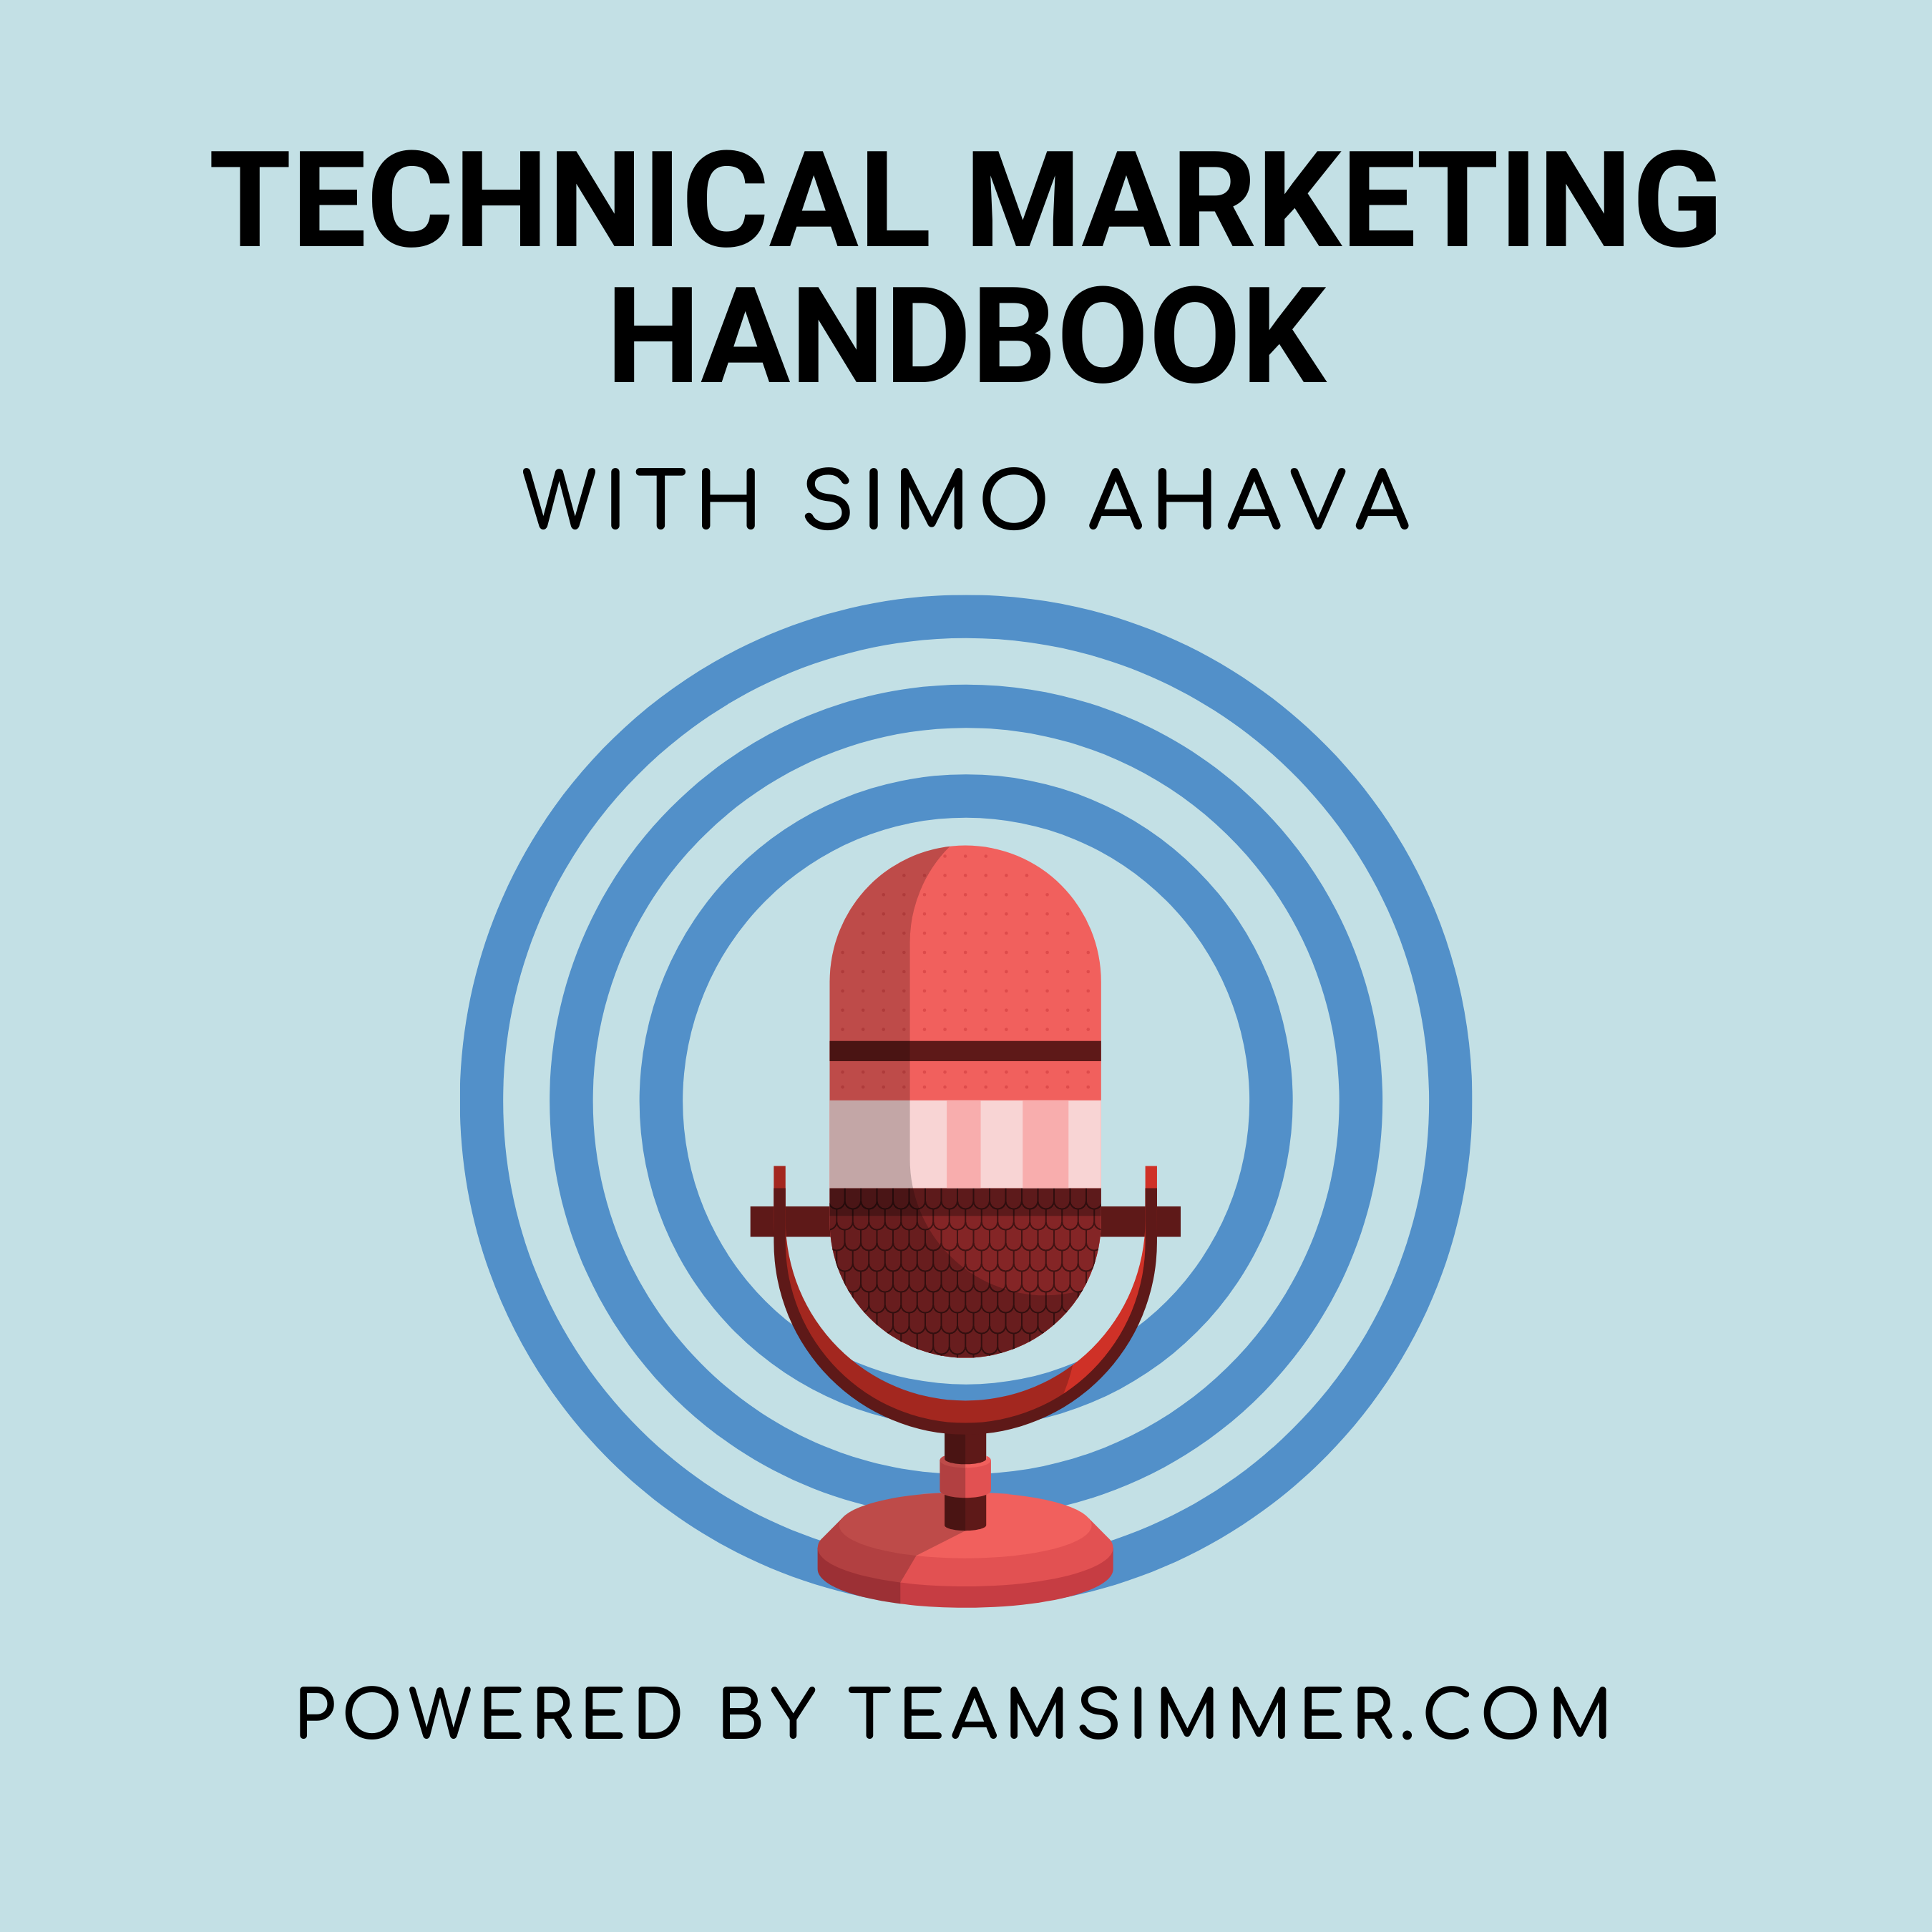 Technical Marketing Handbook